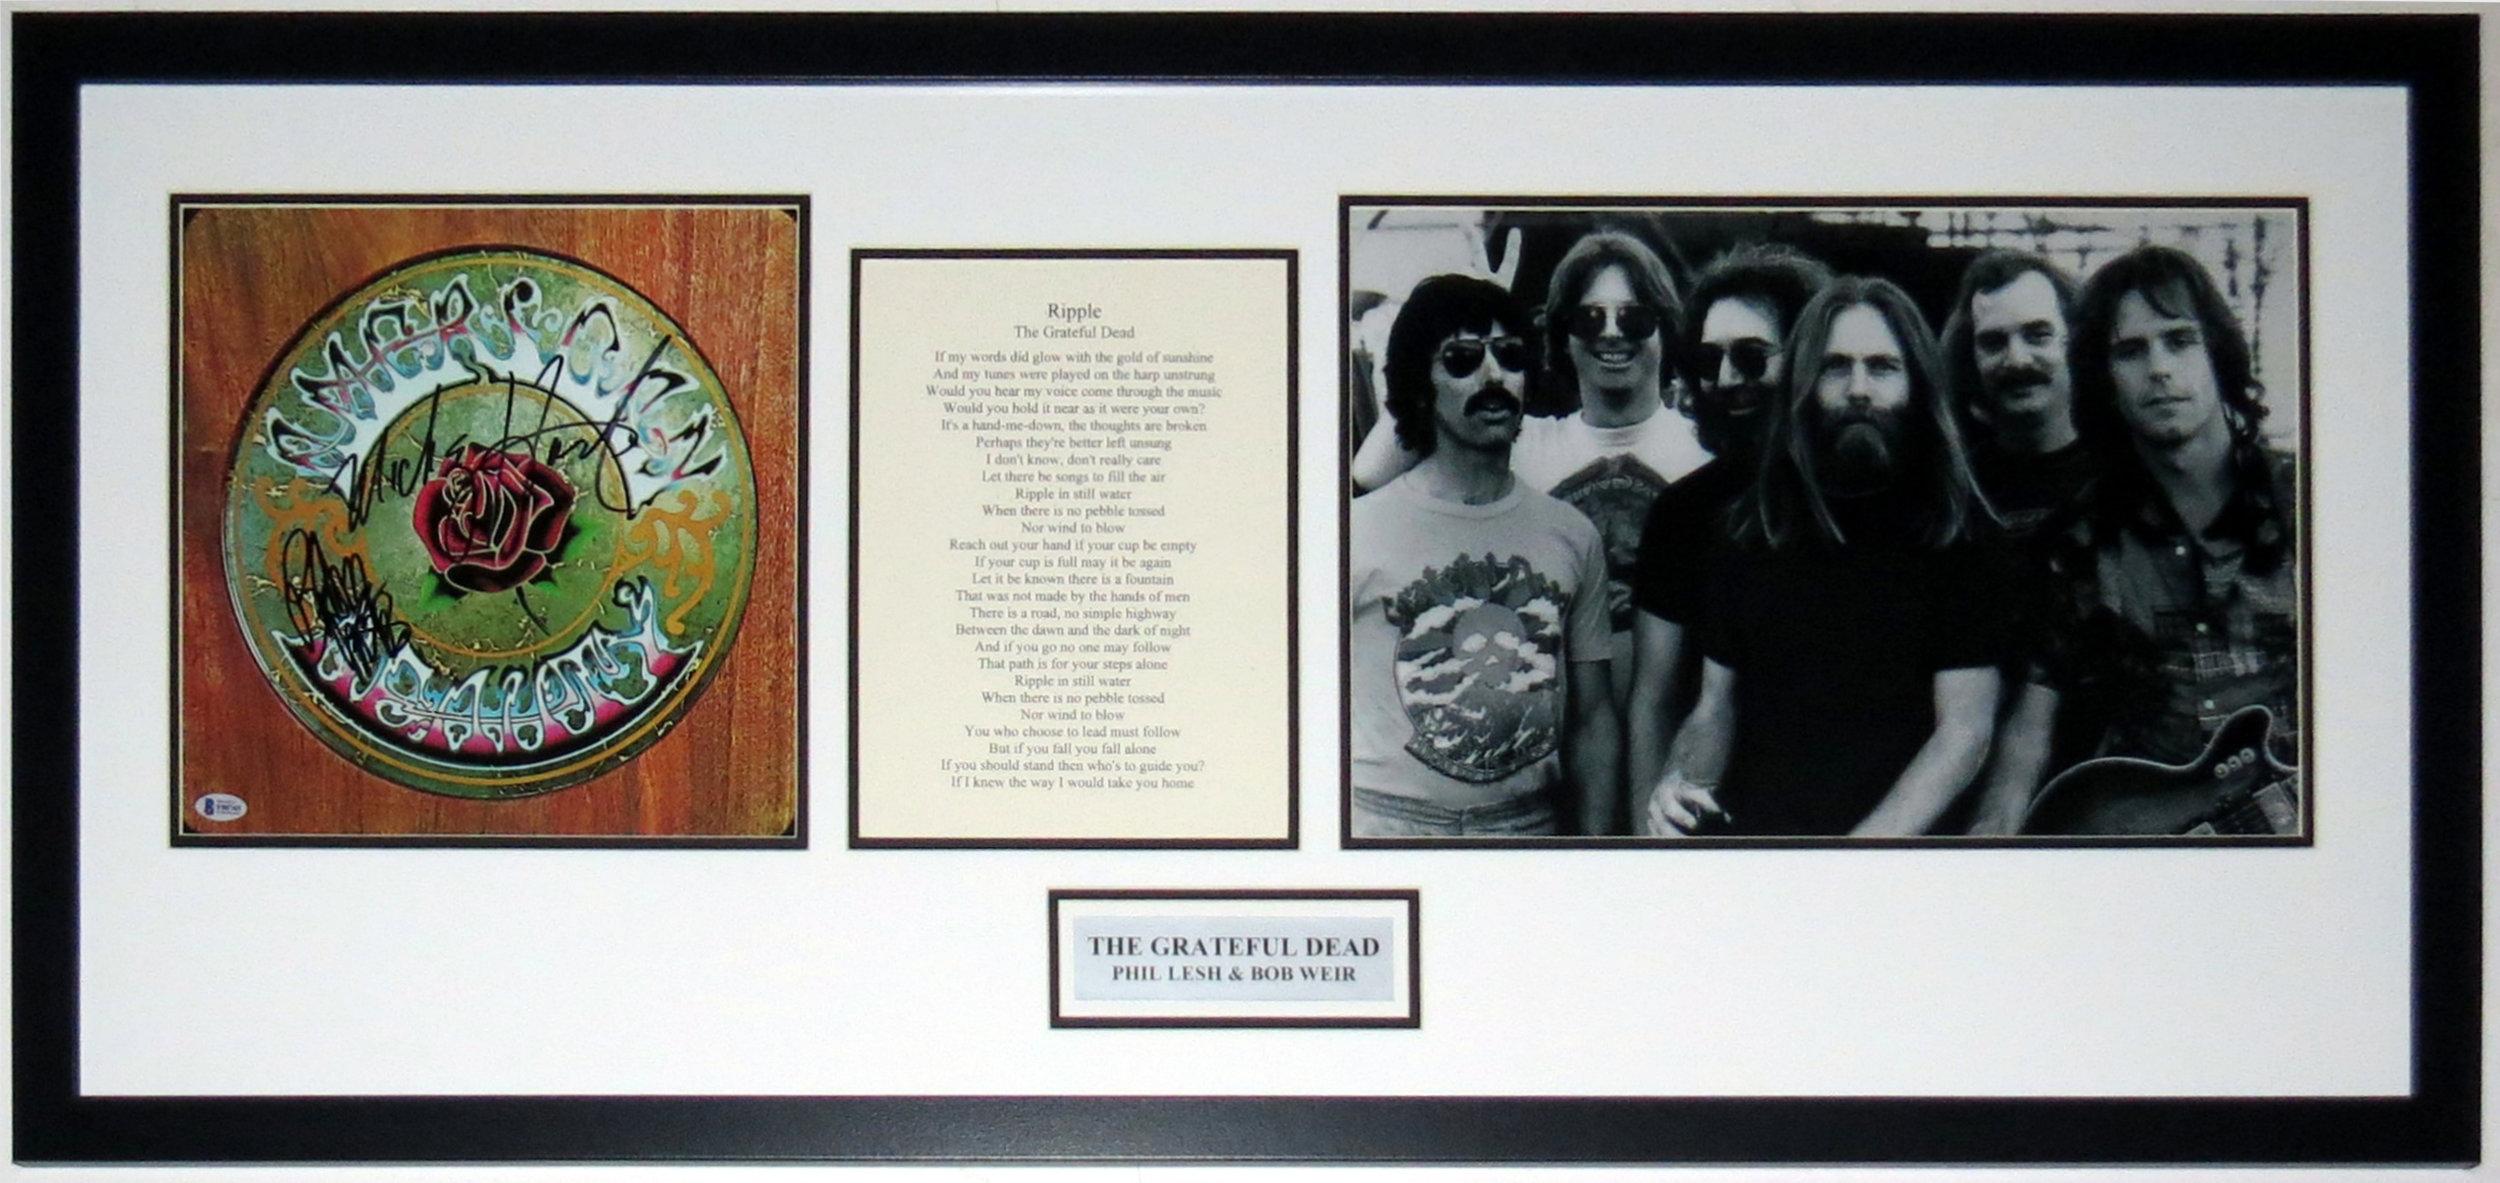 Bob Weir & Mickey Hart Dual Signed The Grateful Dead American Beauty Album - Beckett Authentication Services BAS COA - Professionally Framed & Lyrics & Photo